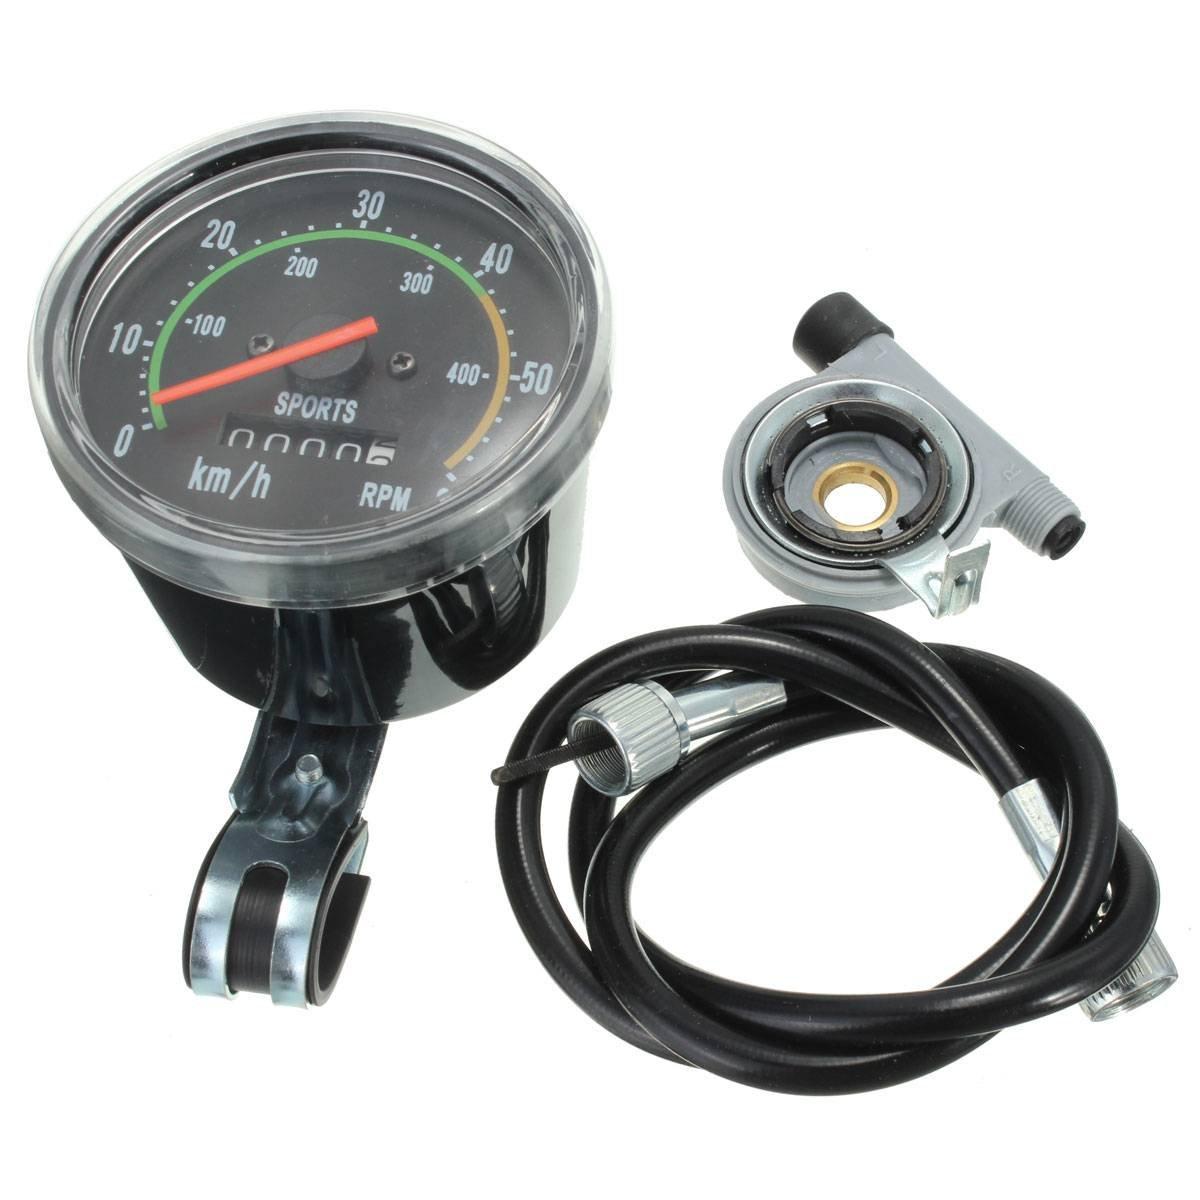 OUTERDO Black Classic Style Resettable Analog Bike Speedometer ...